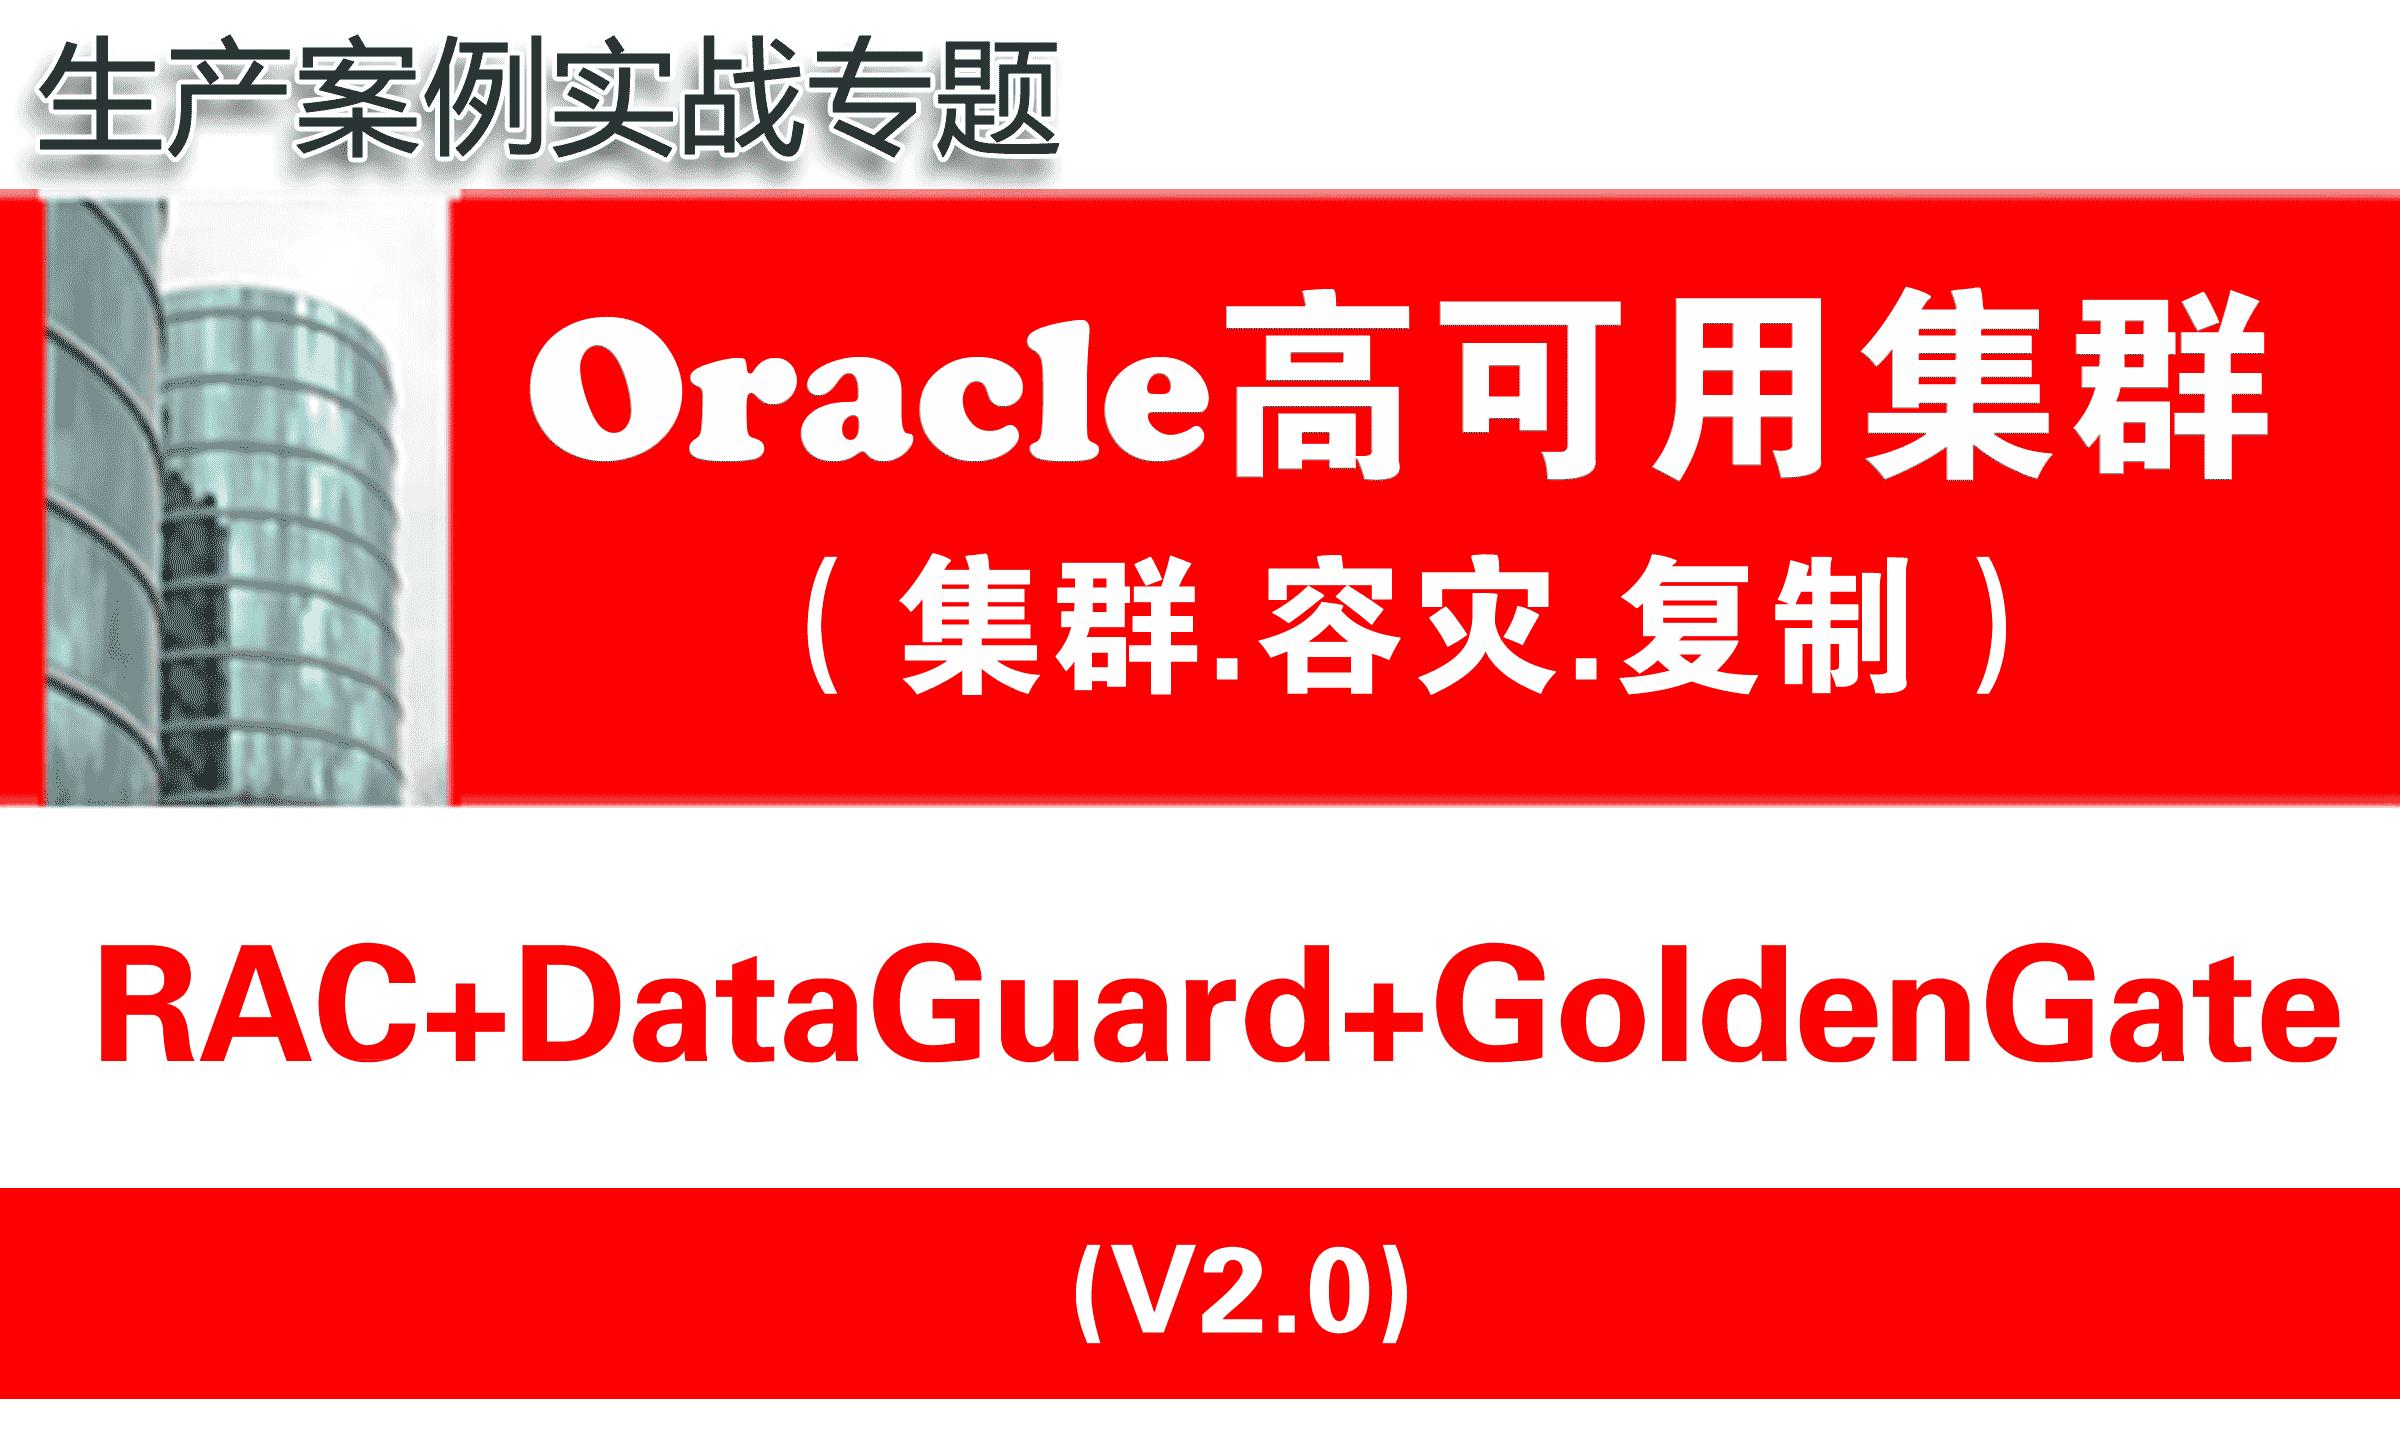 Oracle集群容灾专题2.0(RAC+ADG+OGG)